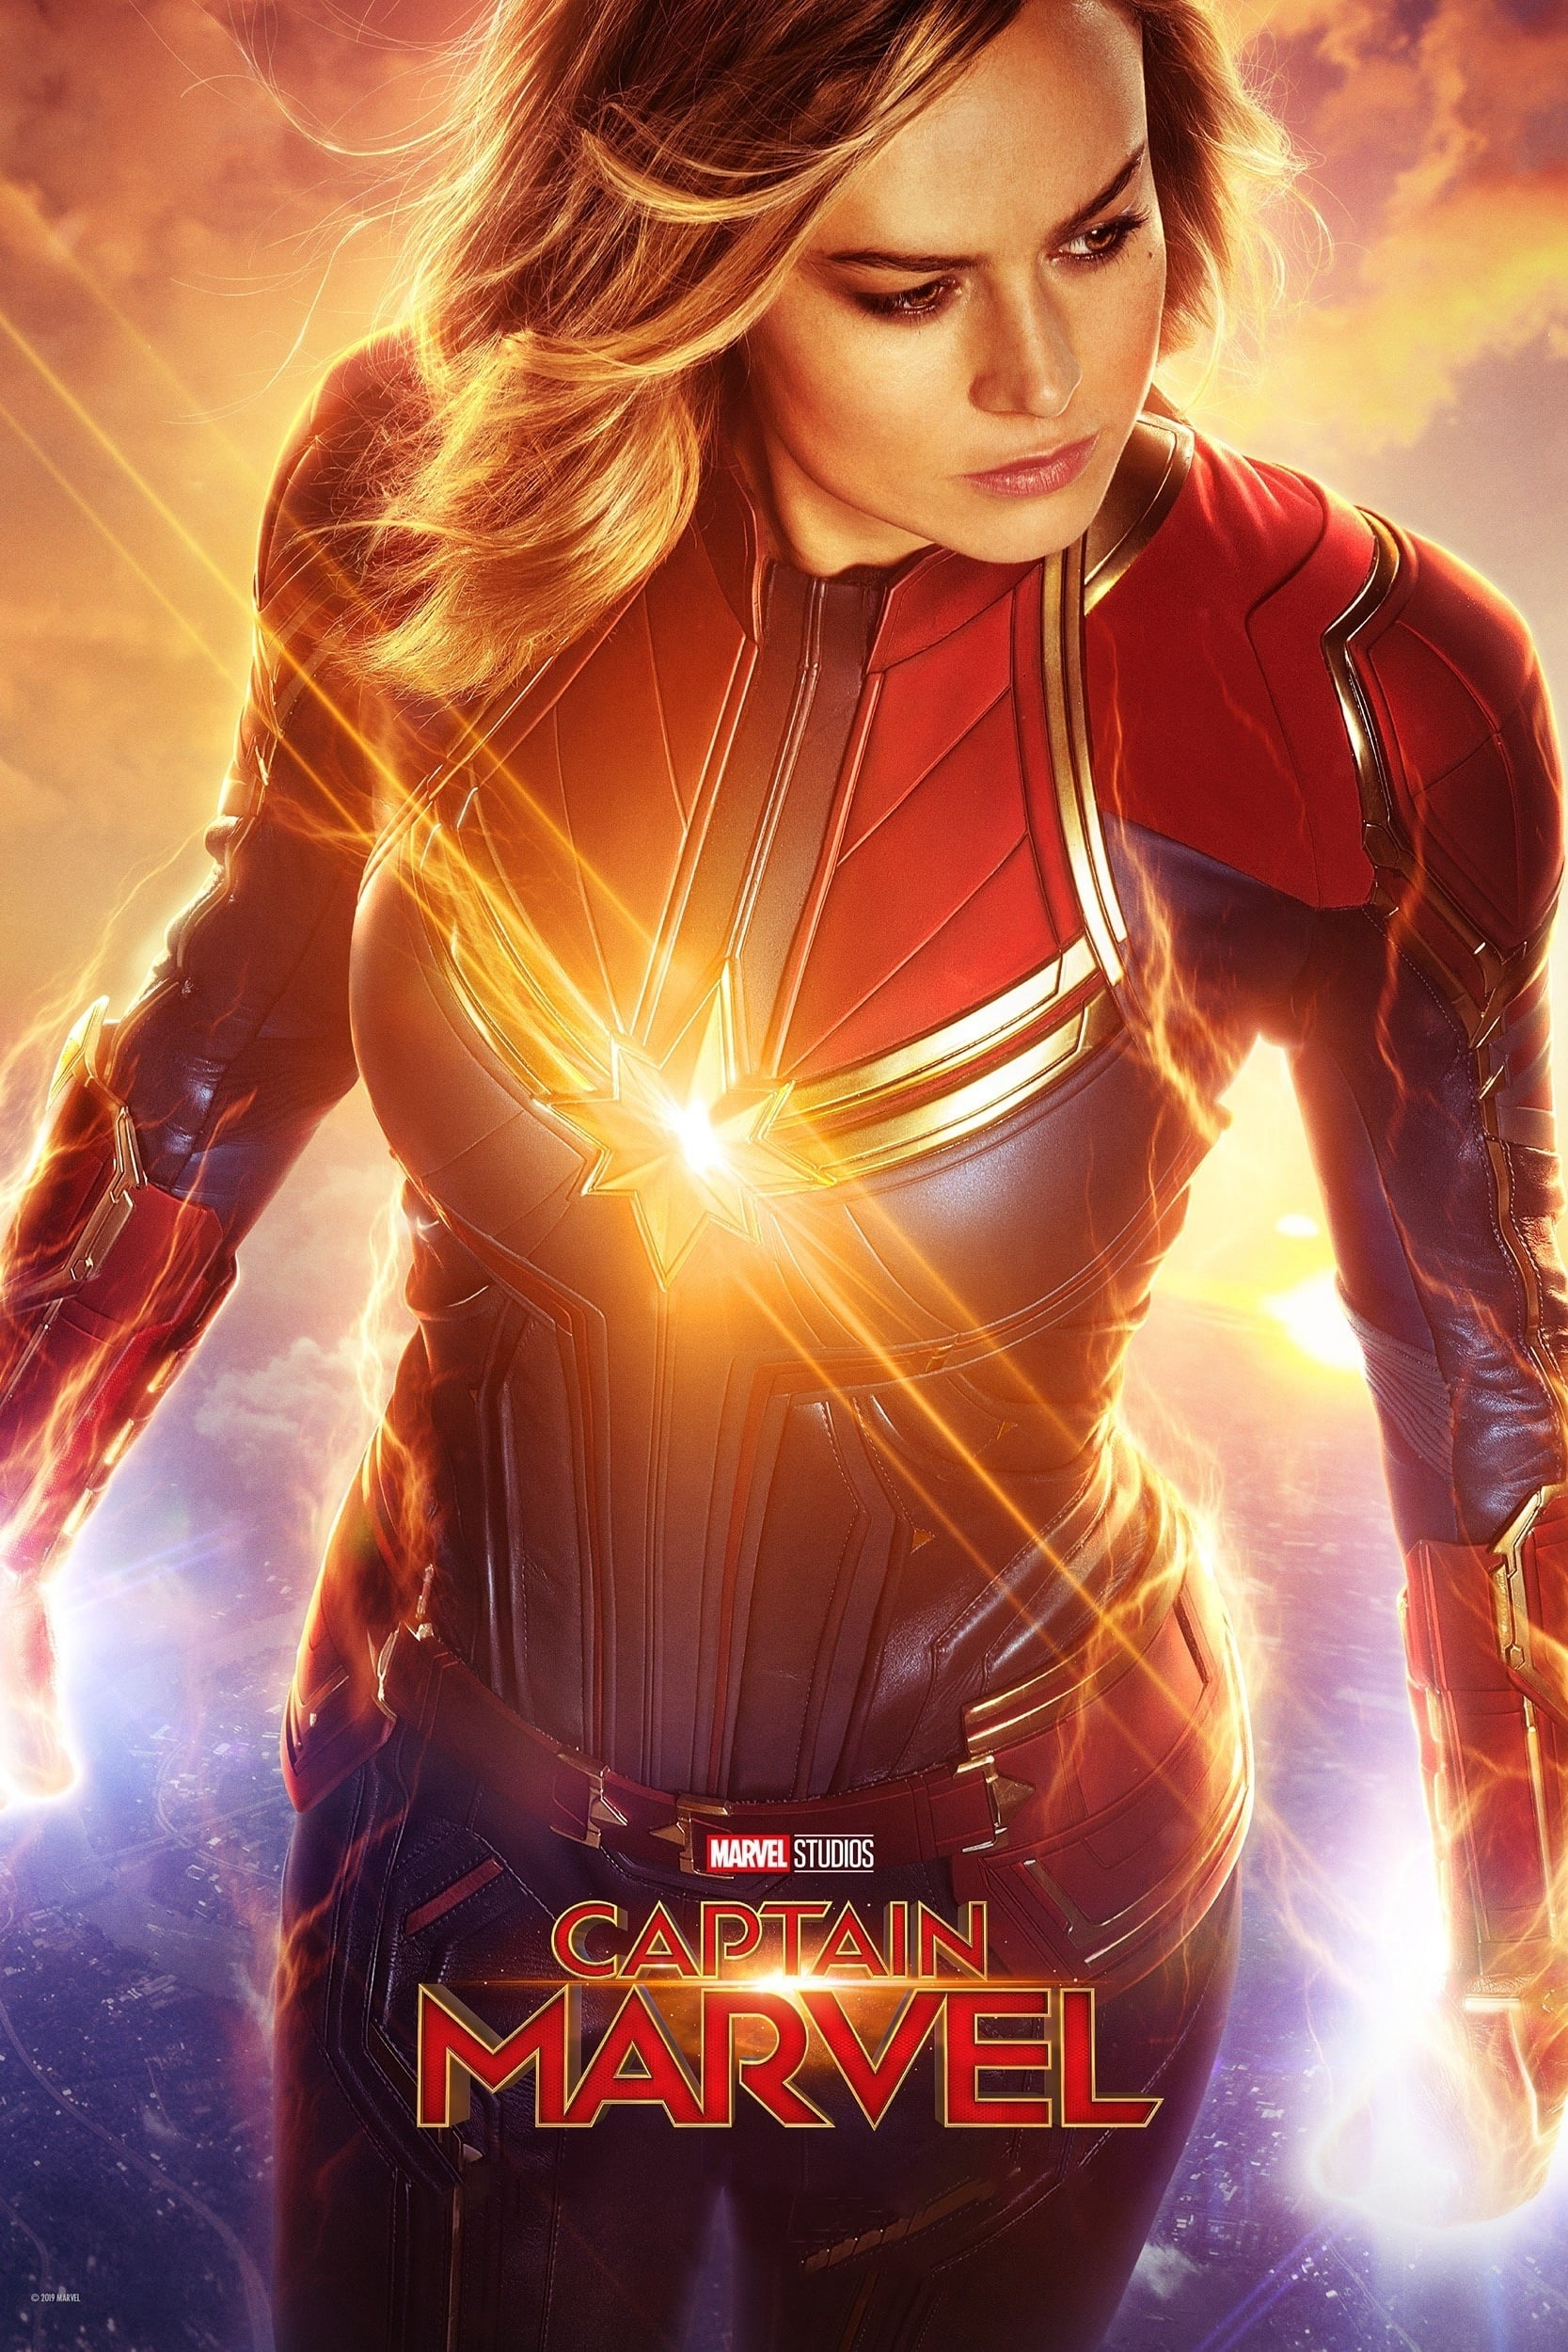 Pelicula Capitana Marvel (2019) HD 1080P LATINO/INGLES Online imagen